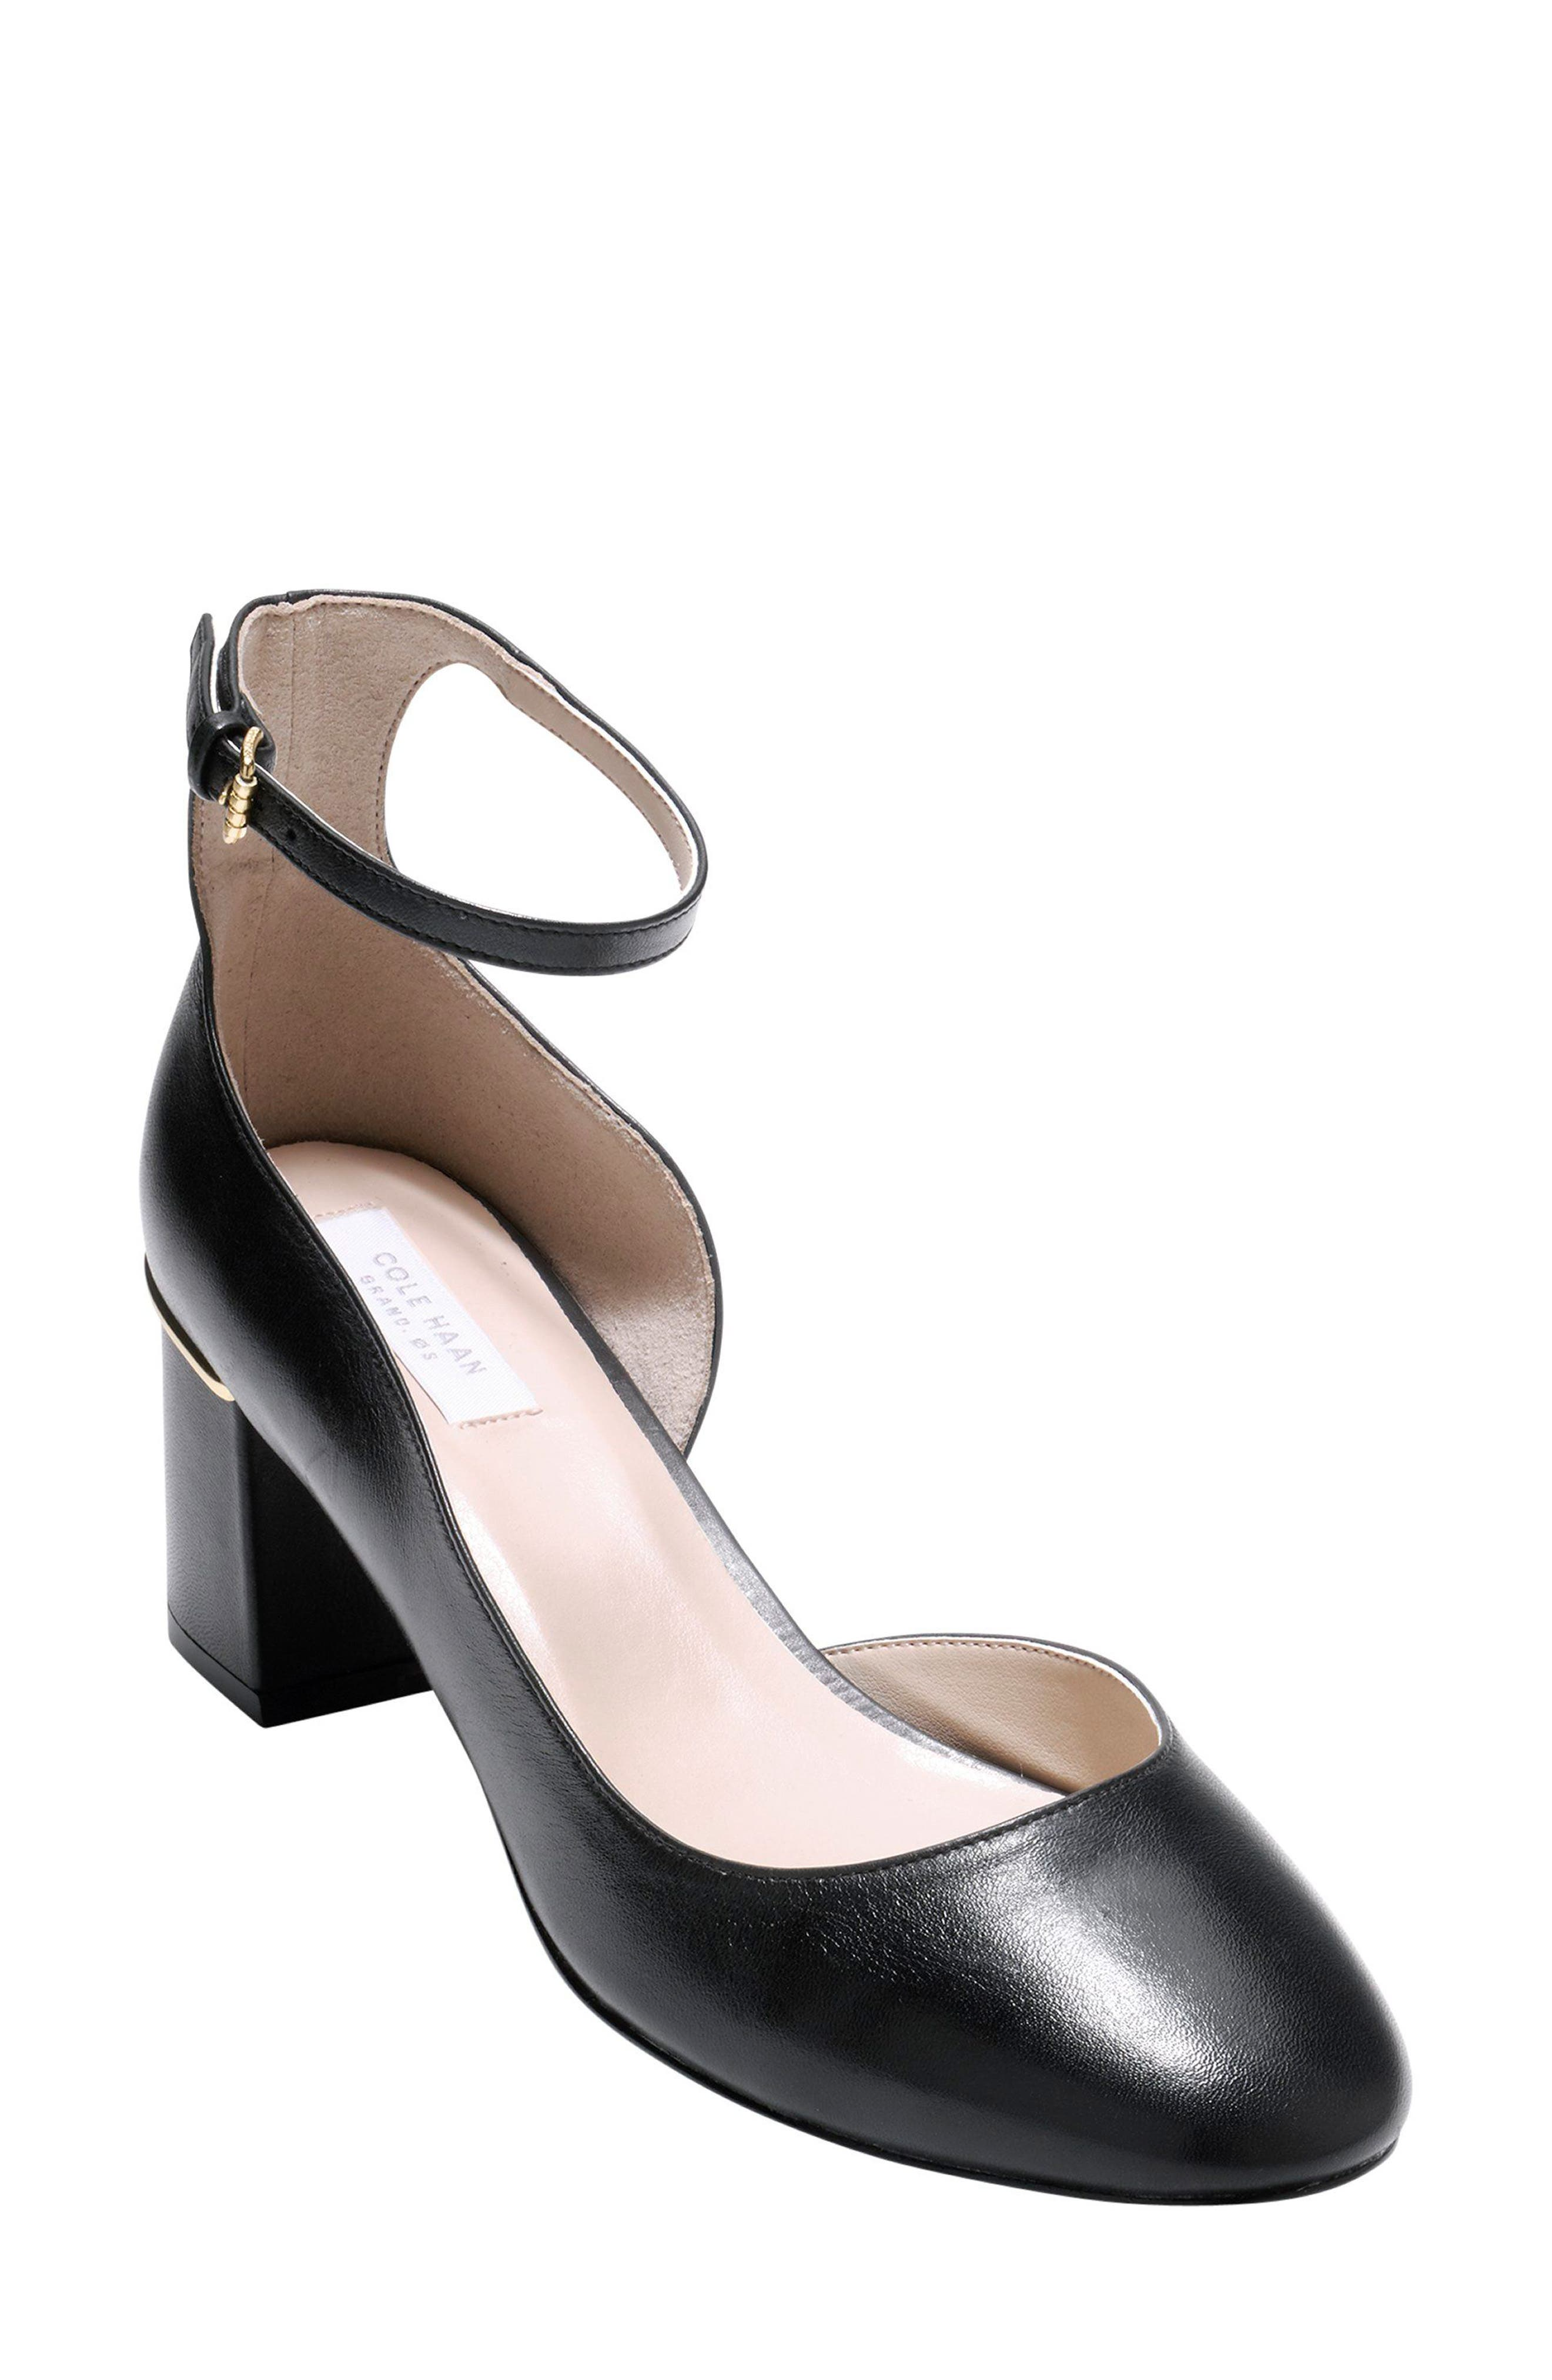 Warner Ankle Strap Pump,                             Main thumbnail 1, color,                             Black Leather